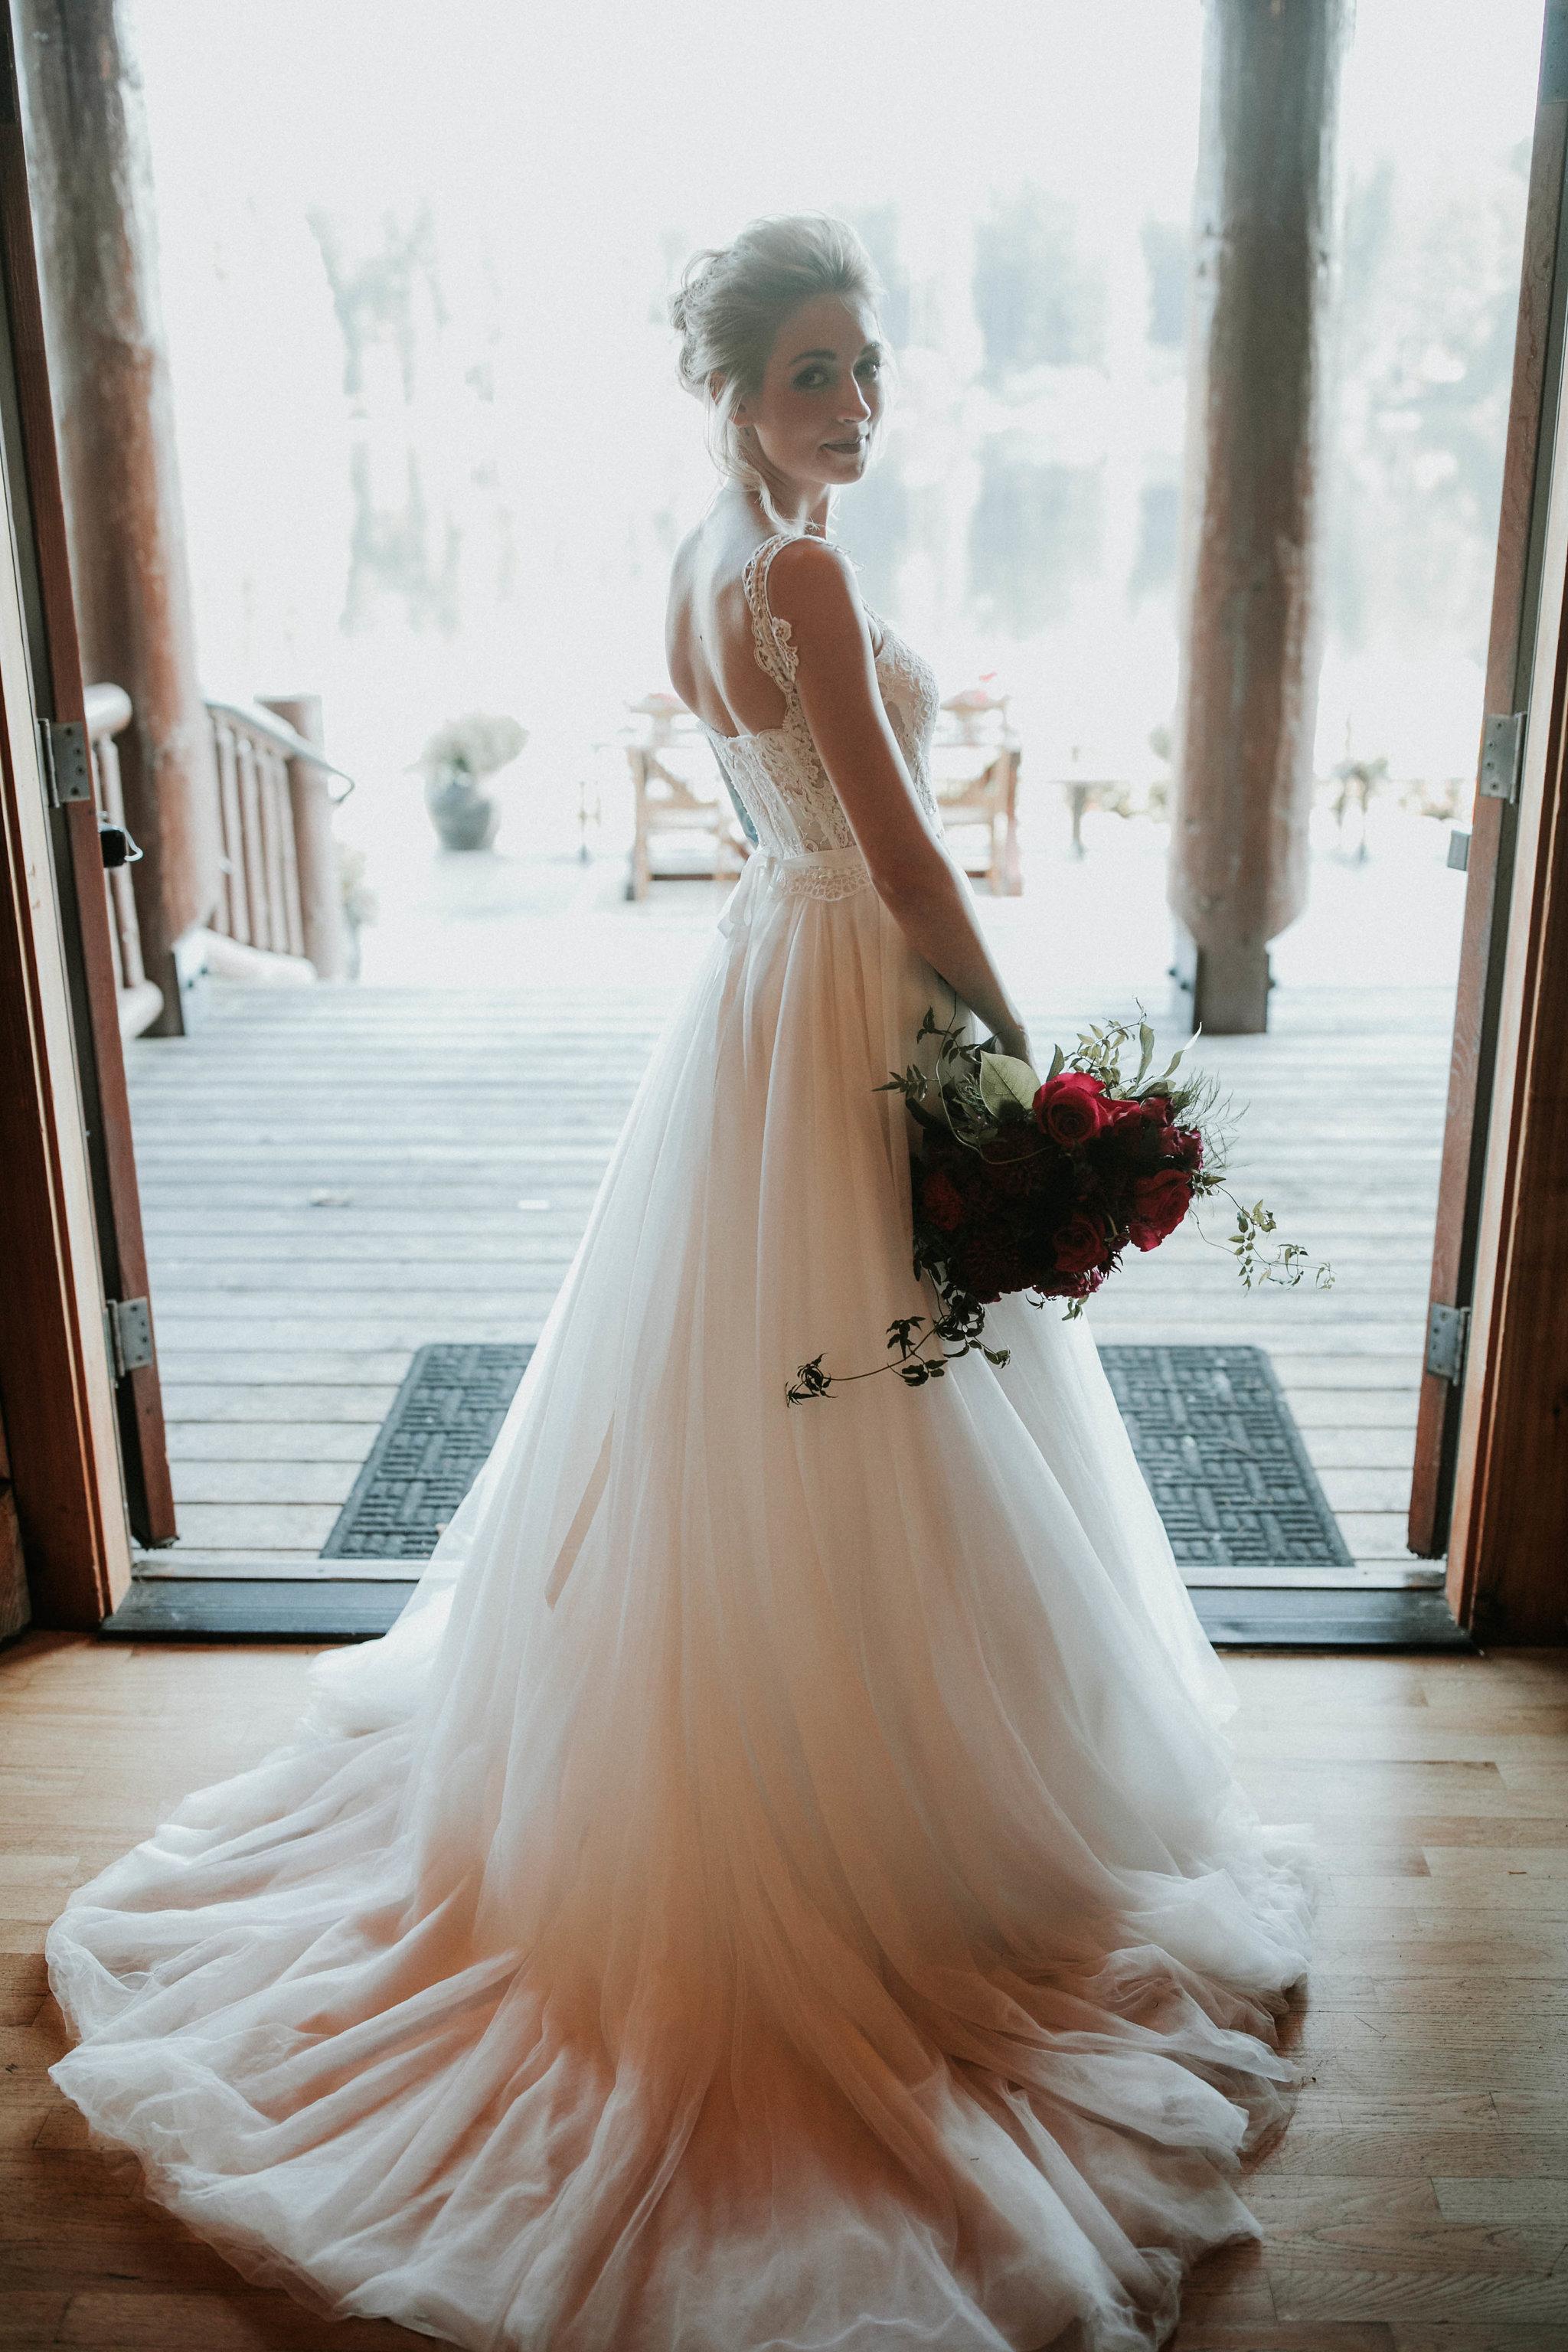 Crystal_Lake_lodge_Wedding_photos_by_Adina_Preston_Weddings_2.JPG